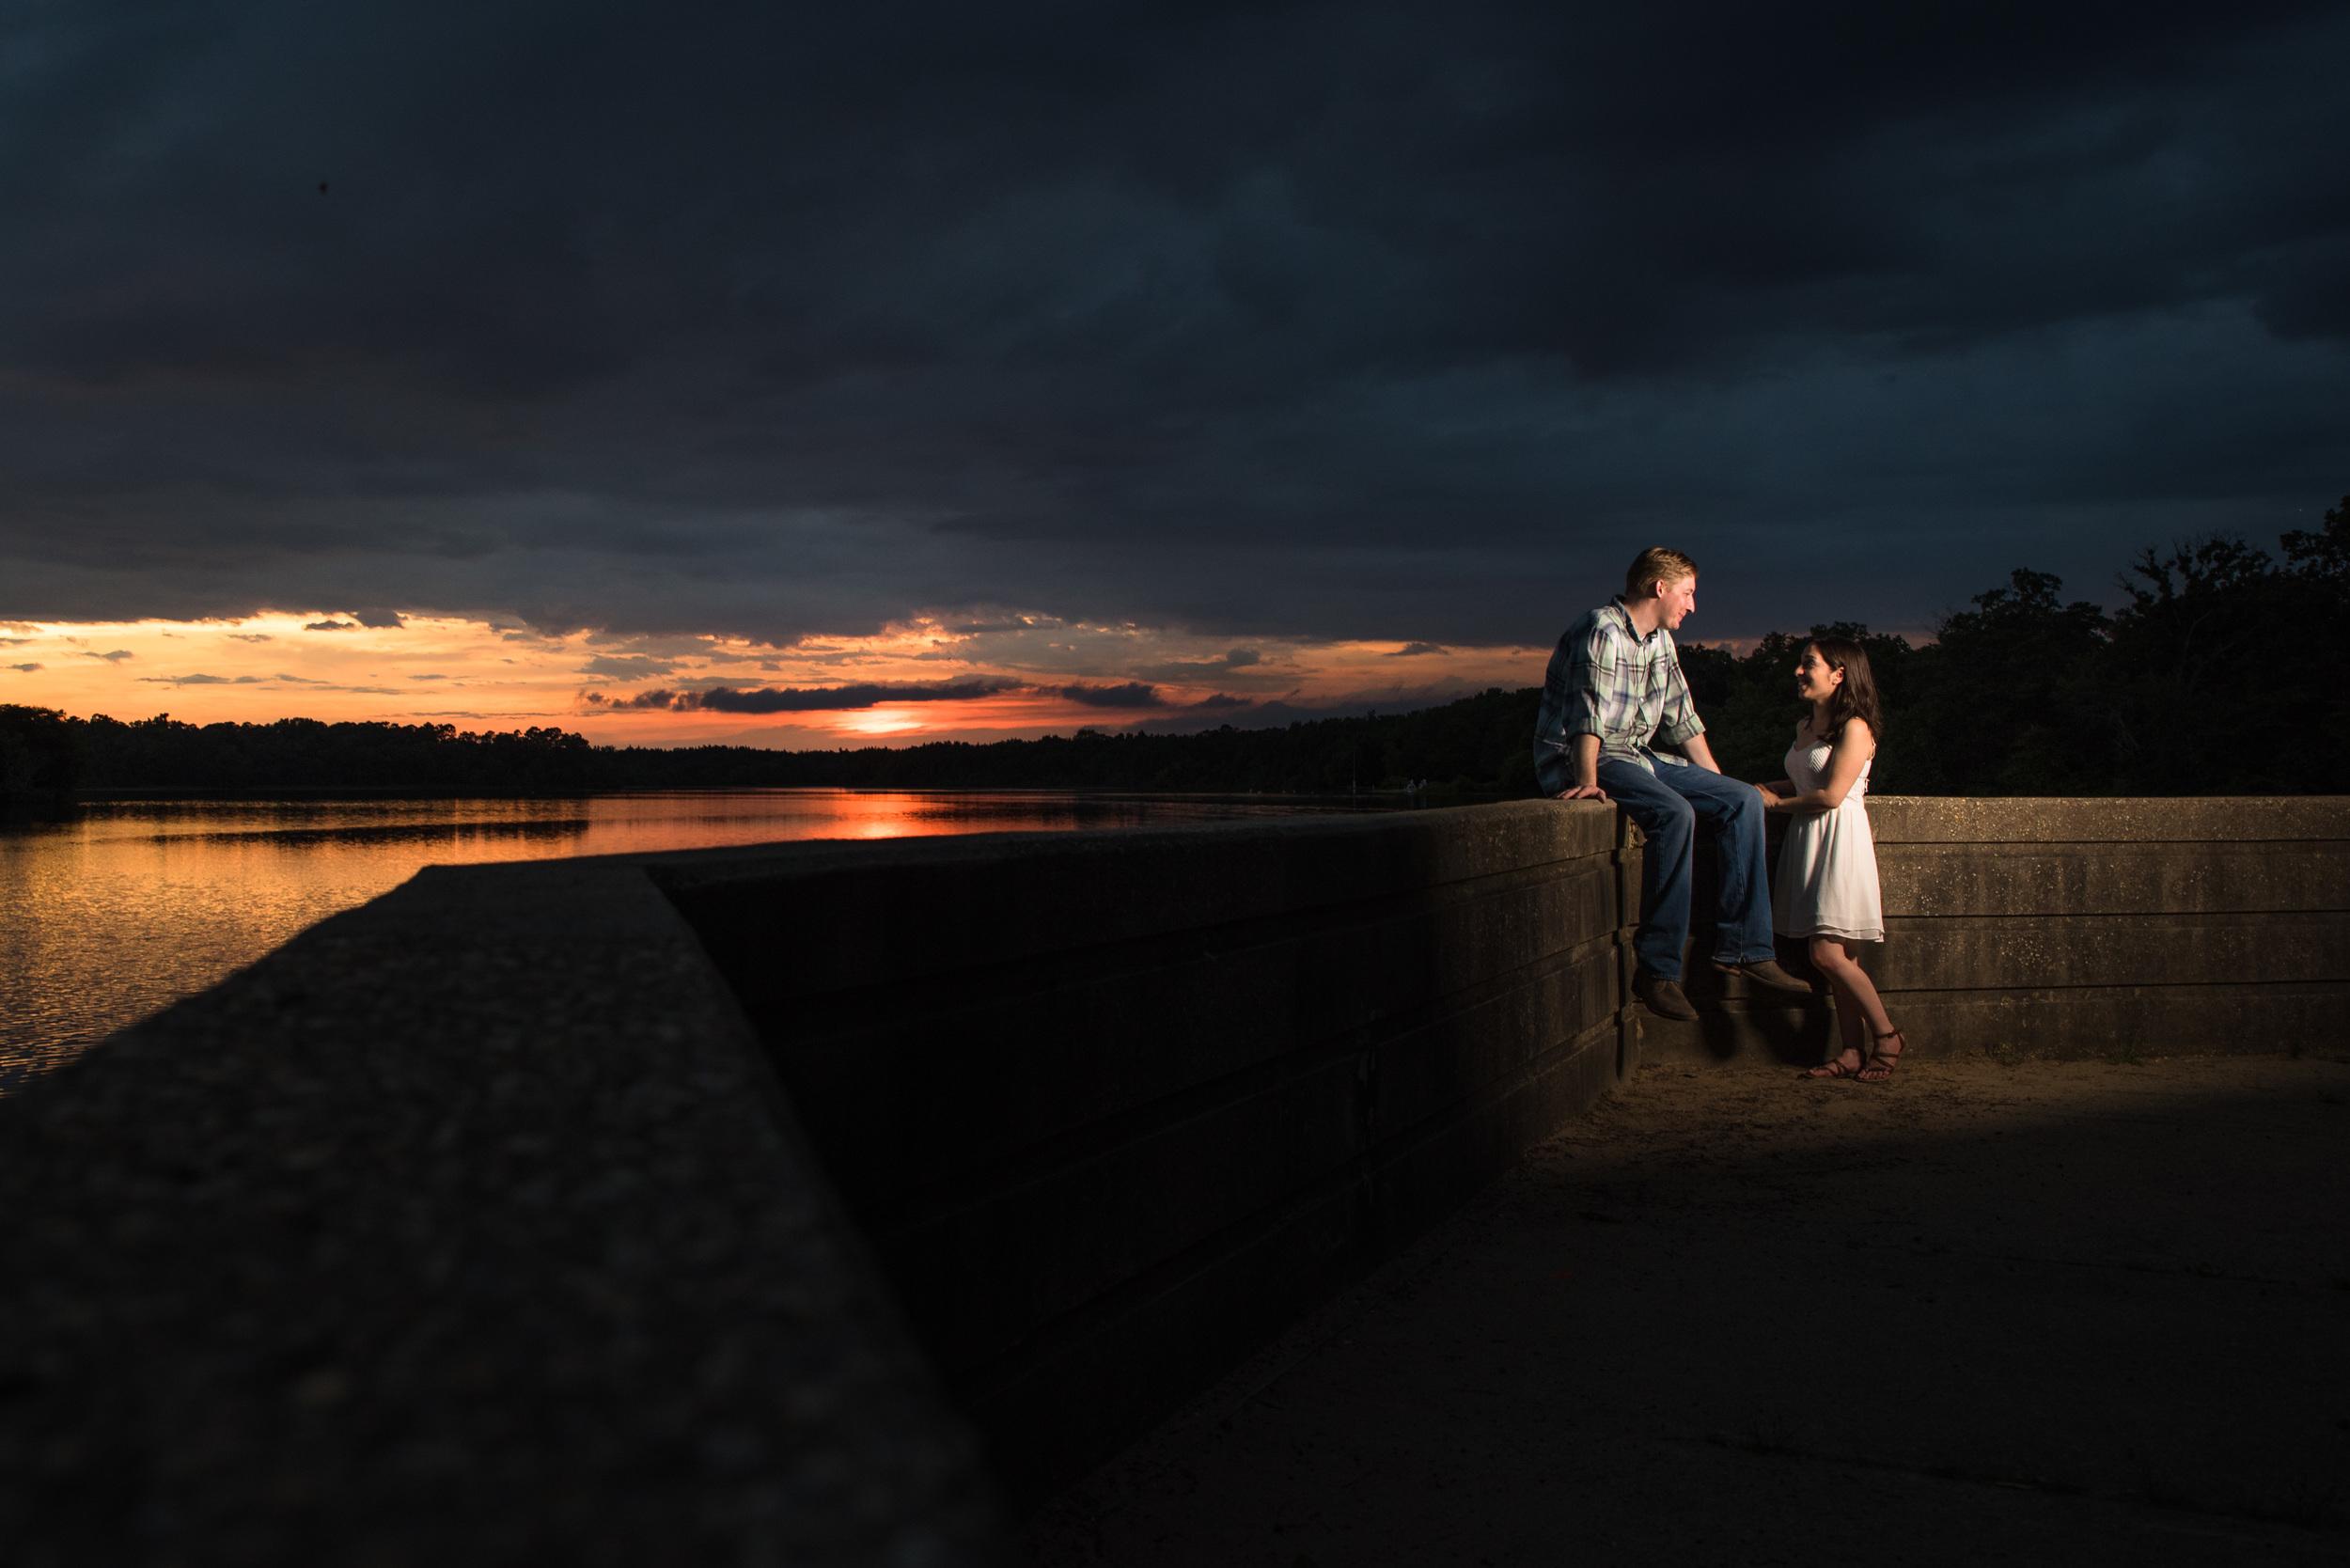 Parvins State Park Engagement Session Brian & Melissa 12